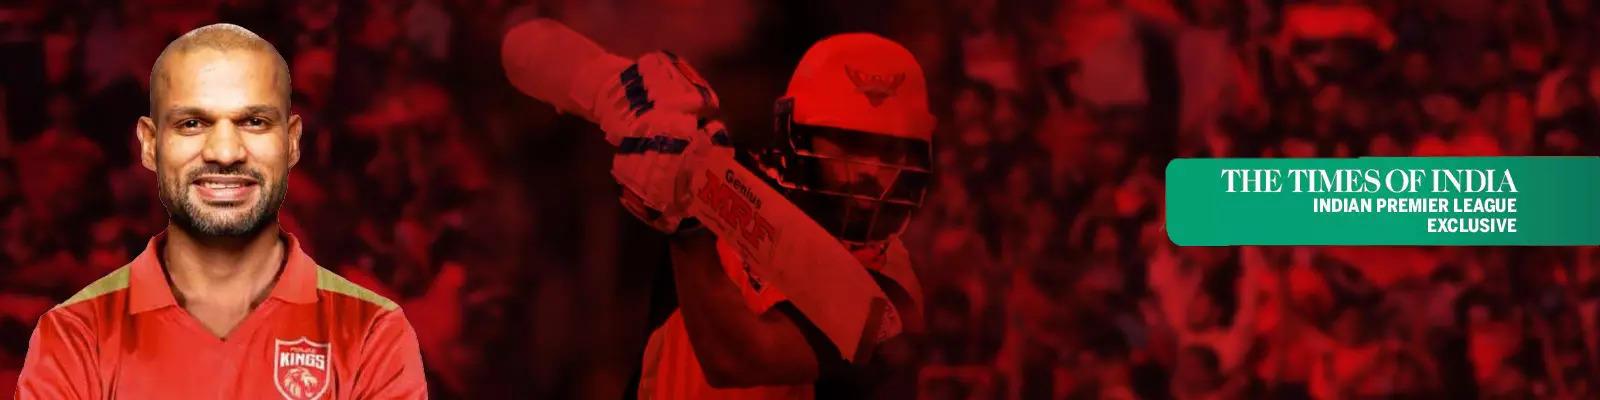 Batsman with most boundaries in IPL History